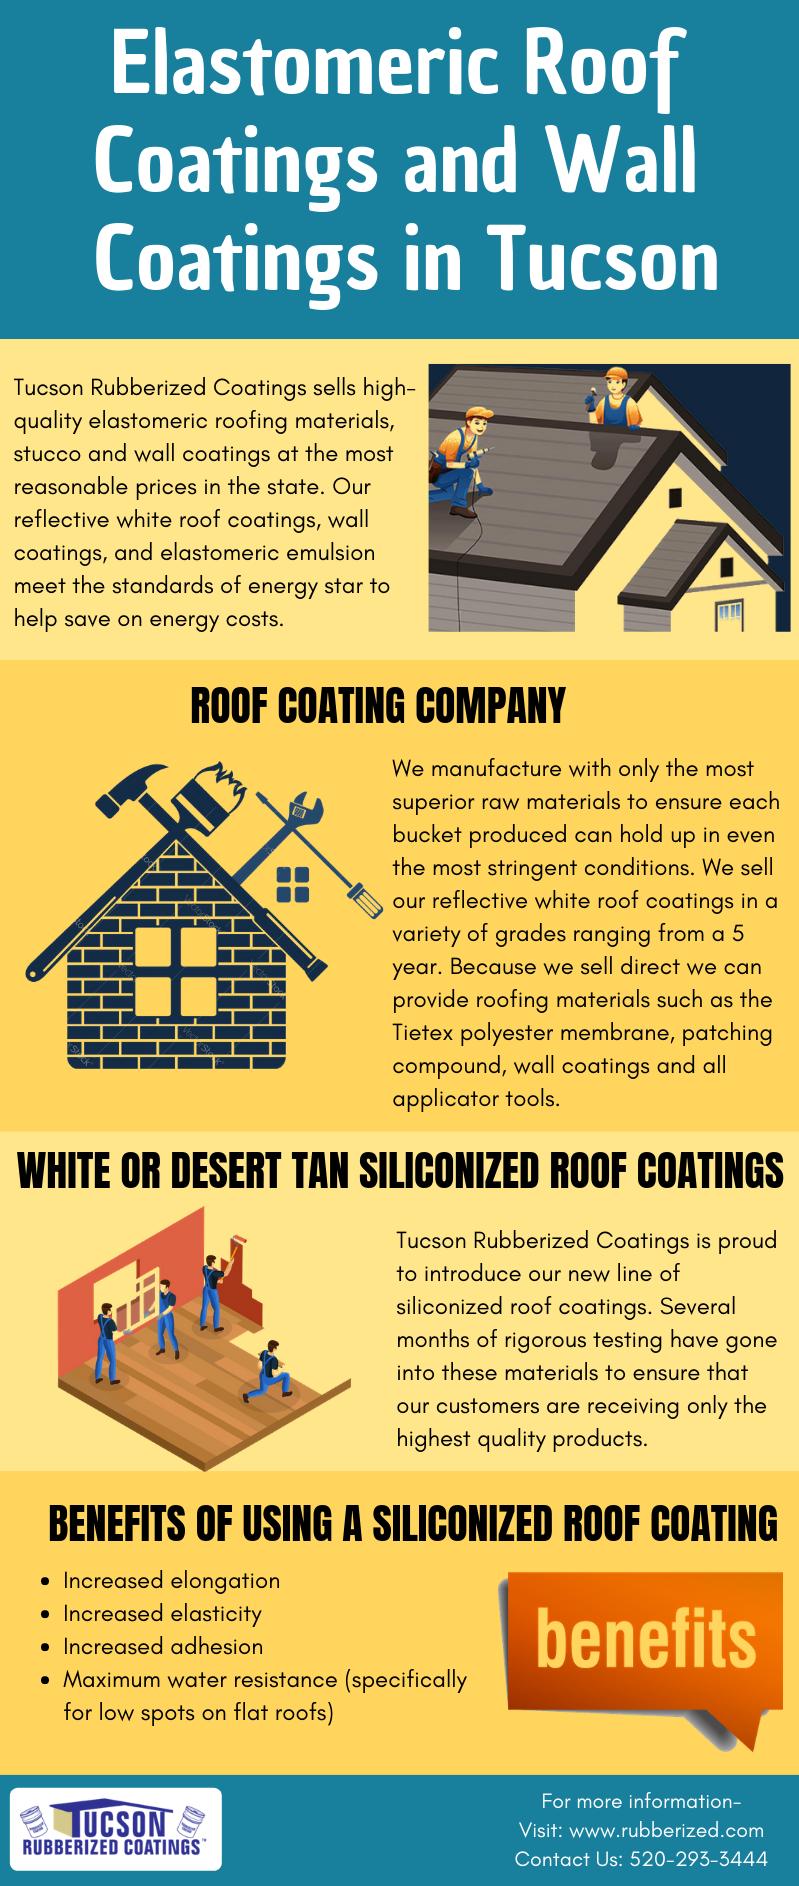 Best Elastomeric Roof Coatings And Wall Coatings In Tucson Roof Coatings Elastomeric Roof Coating Roof Coating